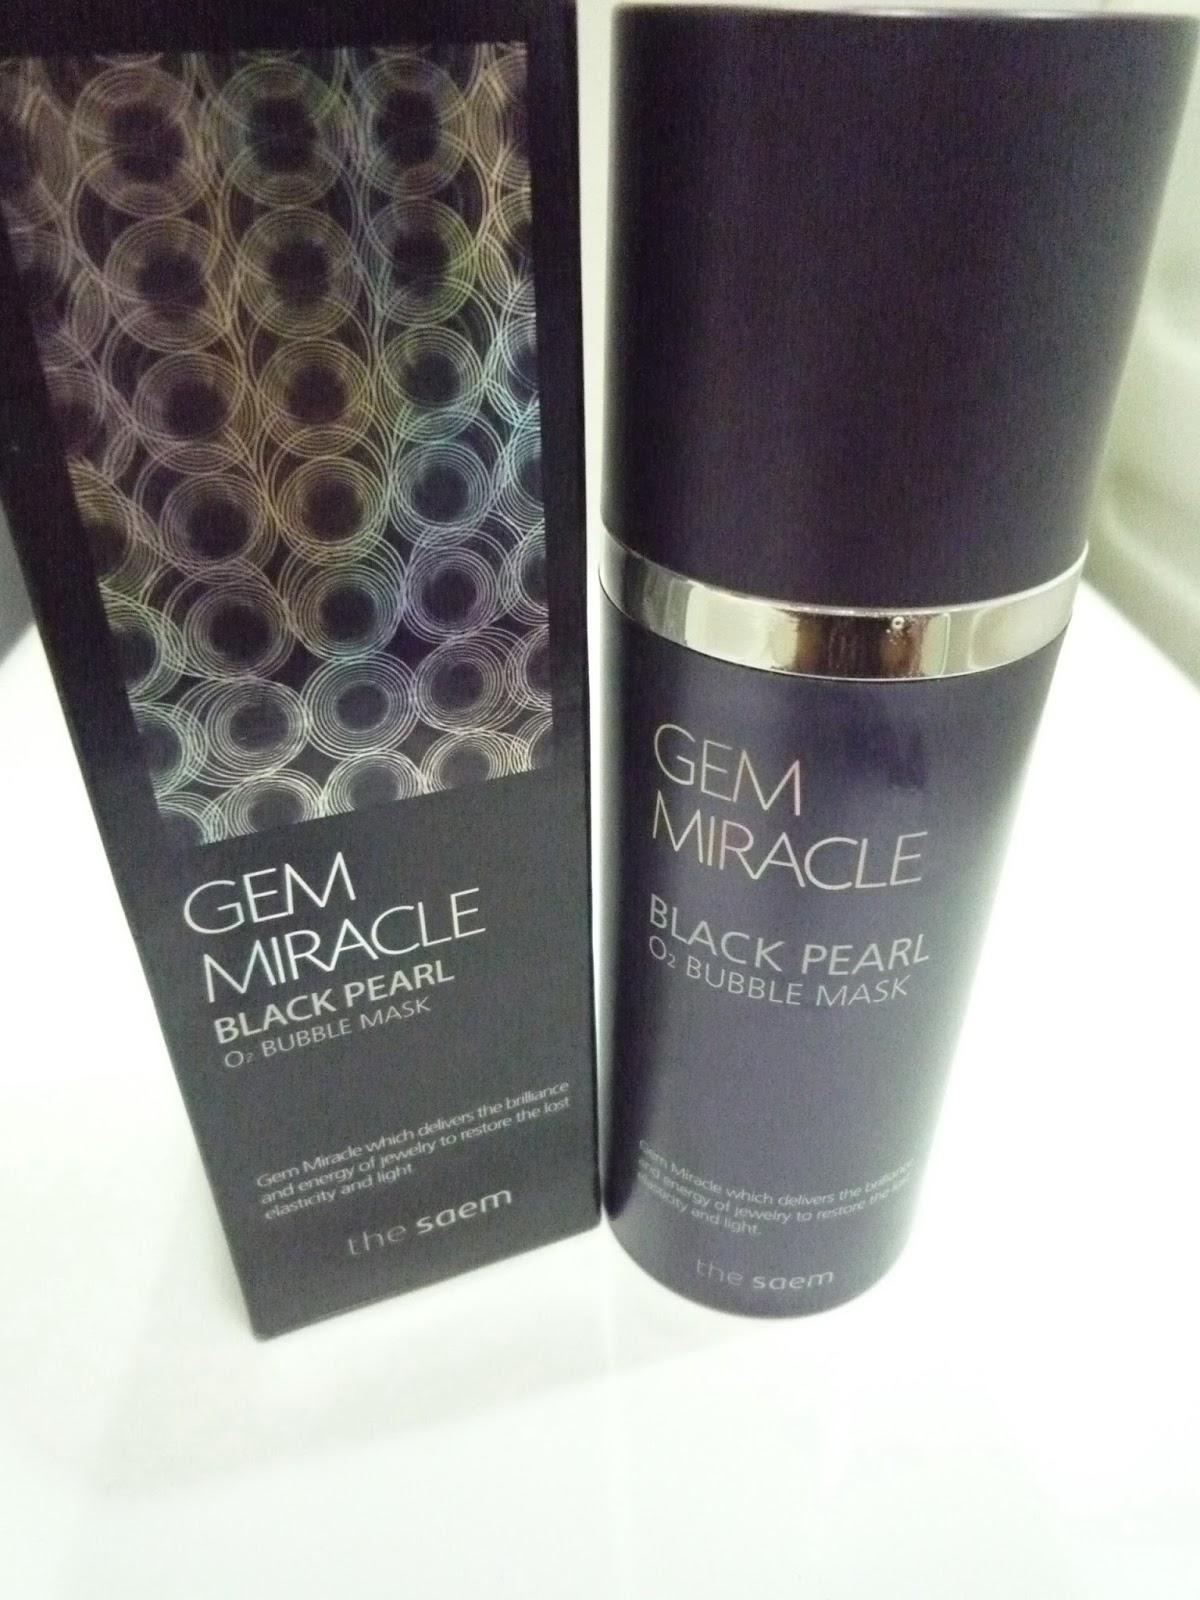 Maruruland: [ 育成美肌 ] The Saem Gem Miracle Black Pearl O2 Bubble Mask 黑珍珠O2泡泡面膜